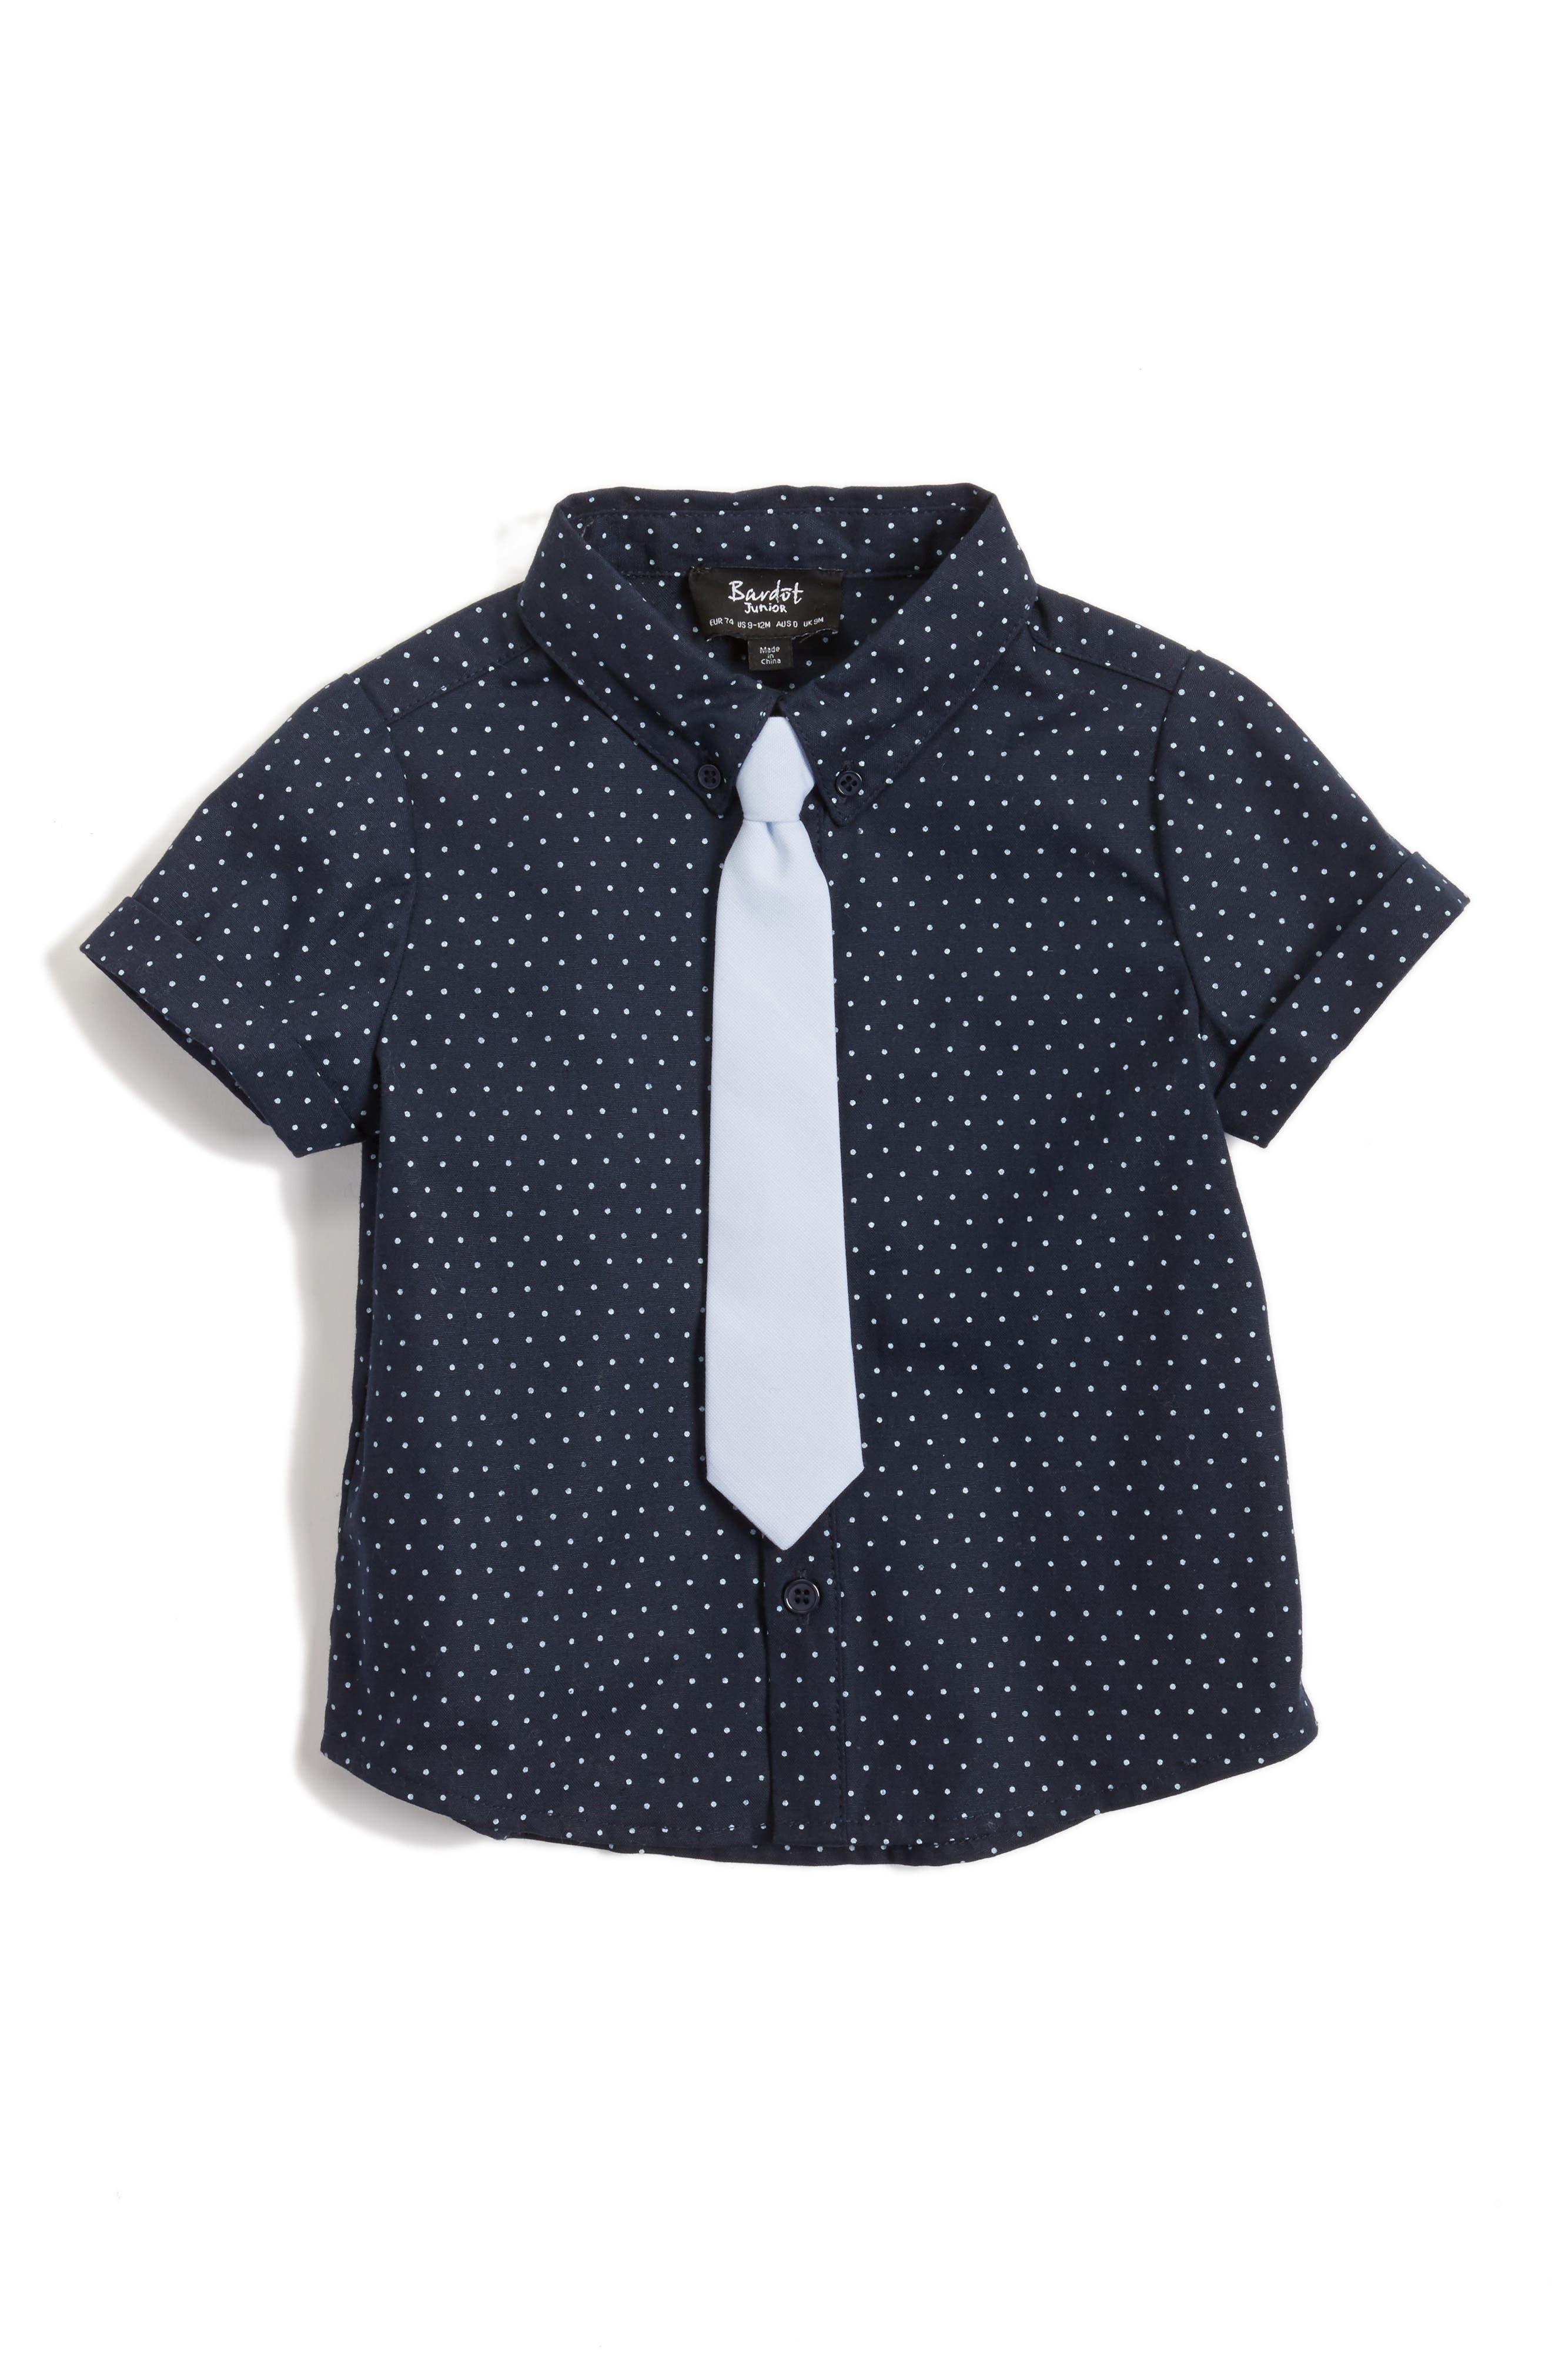 BARDOT JUNIOR Lester Shirt & Tie Set, Main, color, 411